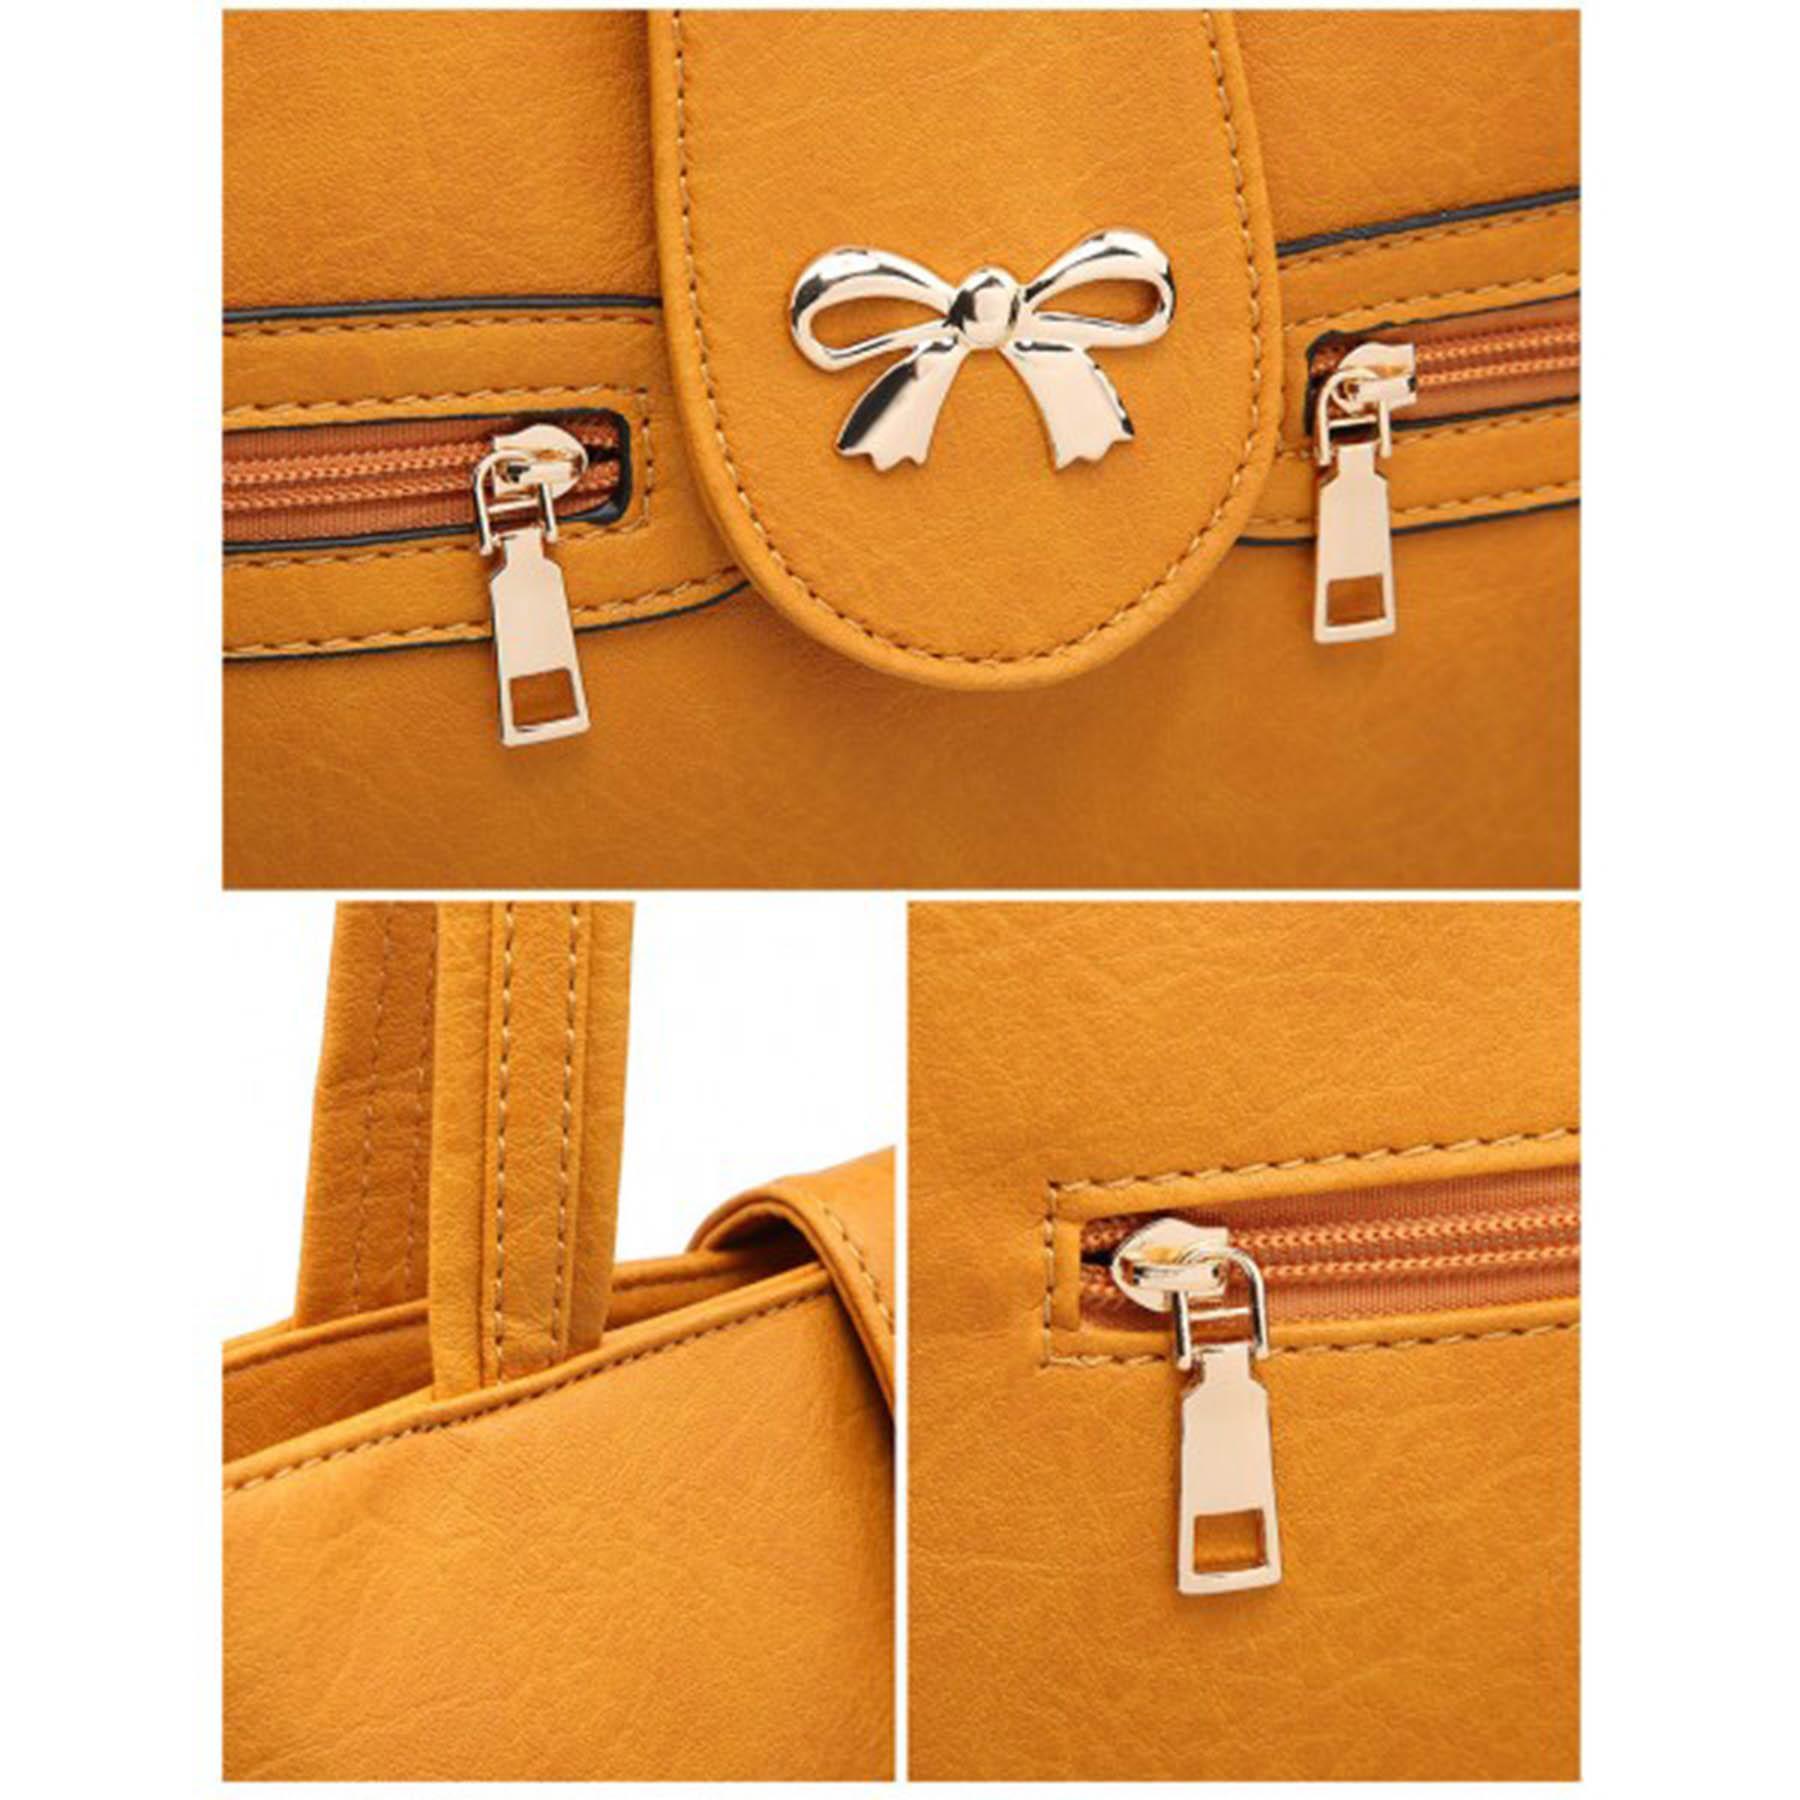 New-Women-s-Metallic-Bow-Decoration-Faux-Leather-Shopper-Shoulder-Tote-Bag thumbnail 11